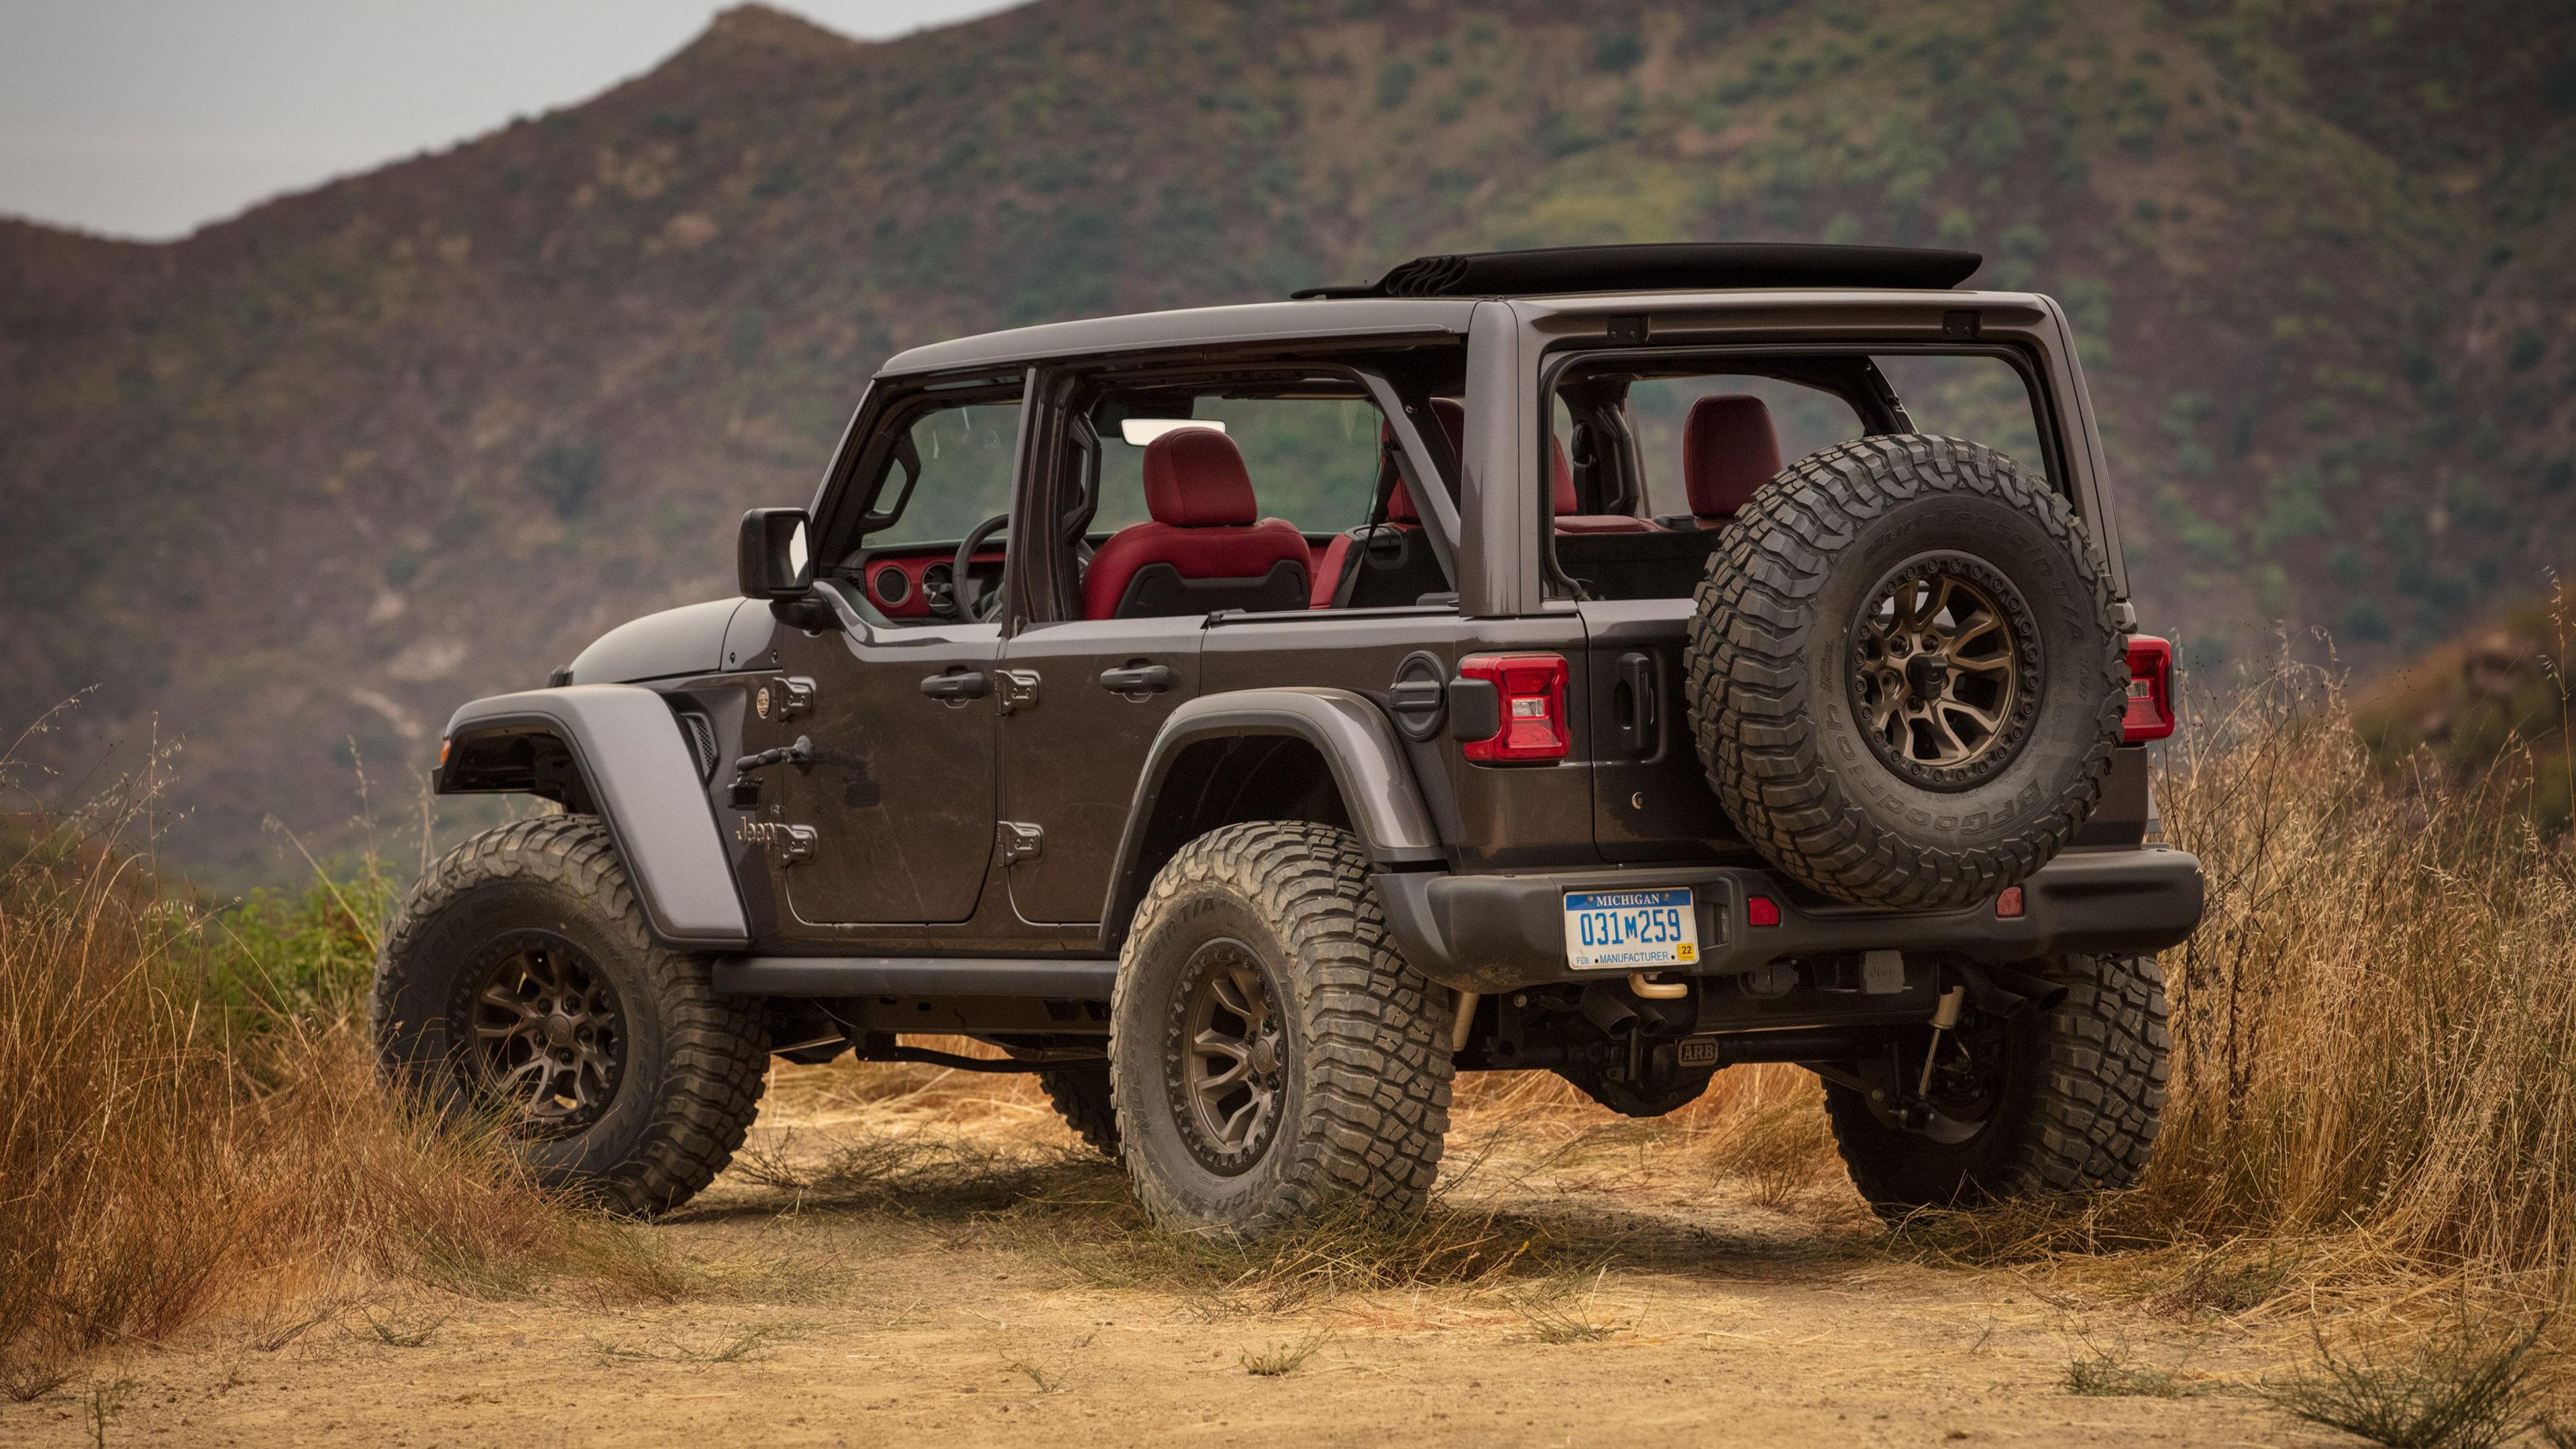 jeep wrangler rubicon 392 concept 2020 4k 2 wallpaper | hd